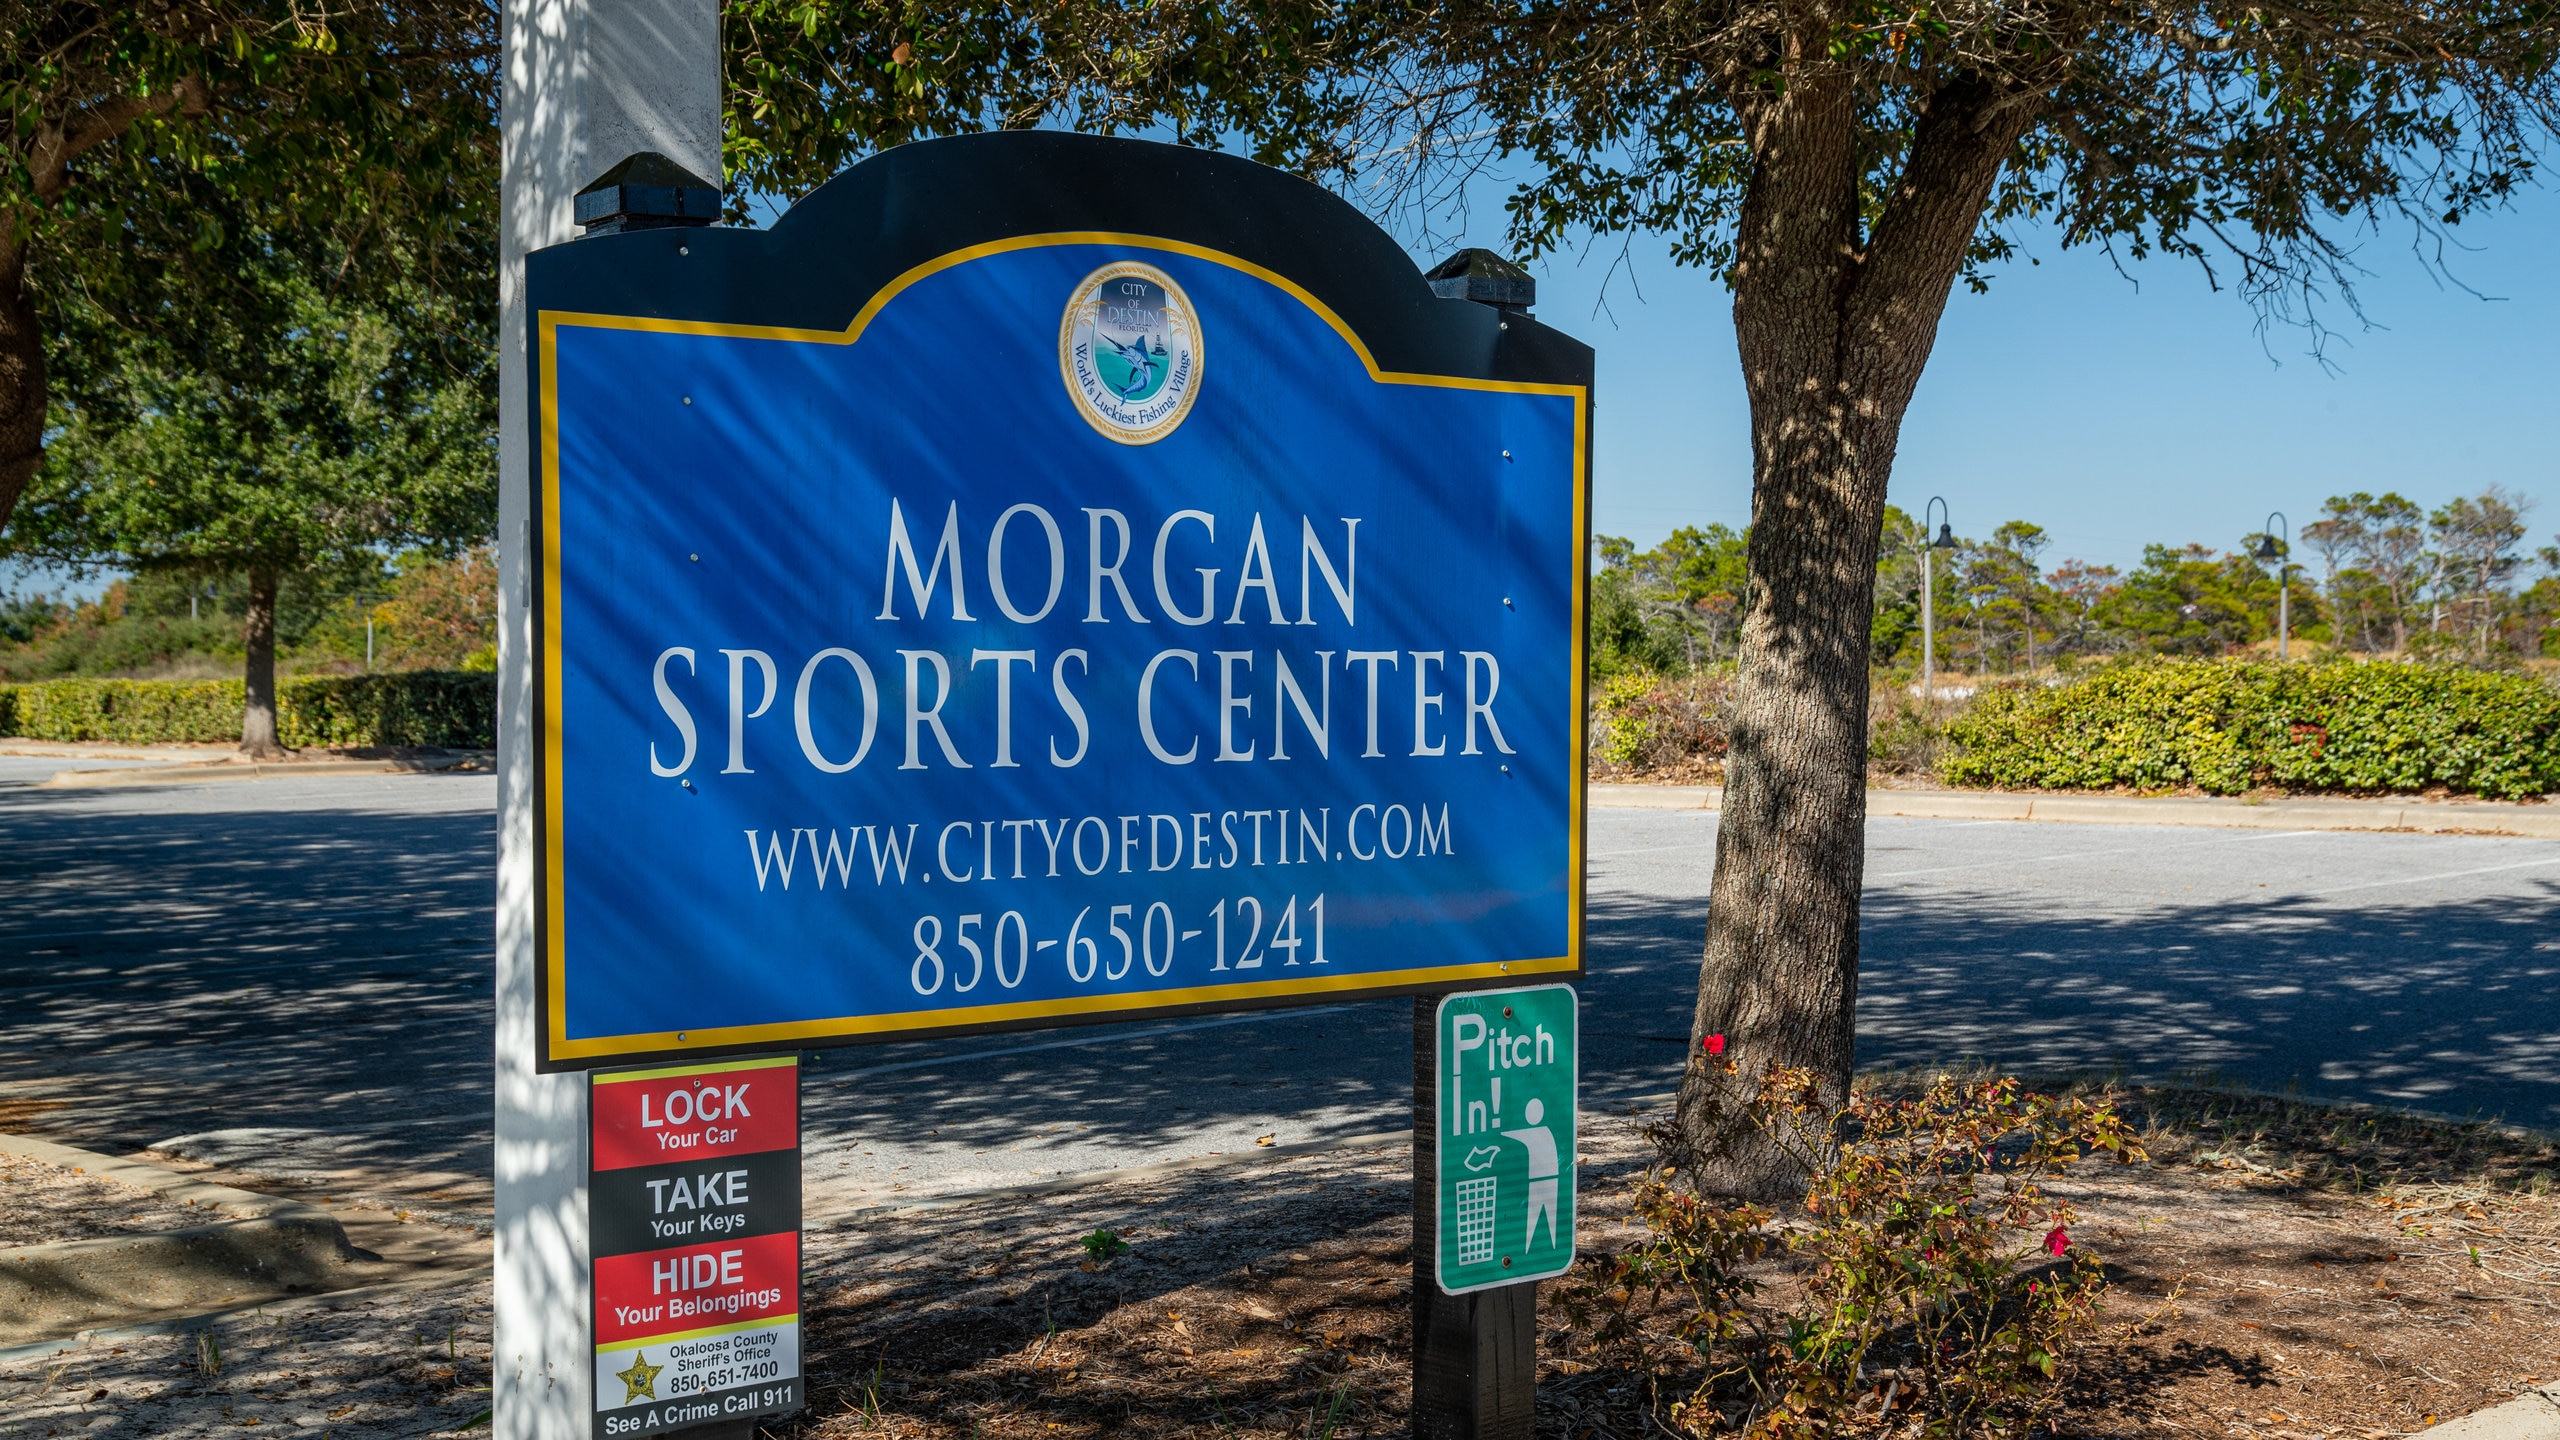 Morgan Sports Center, Destin, Florida, United States of America